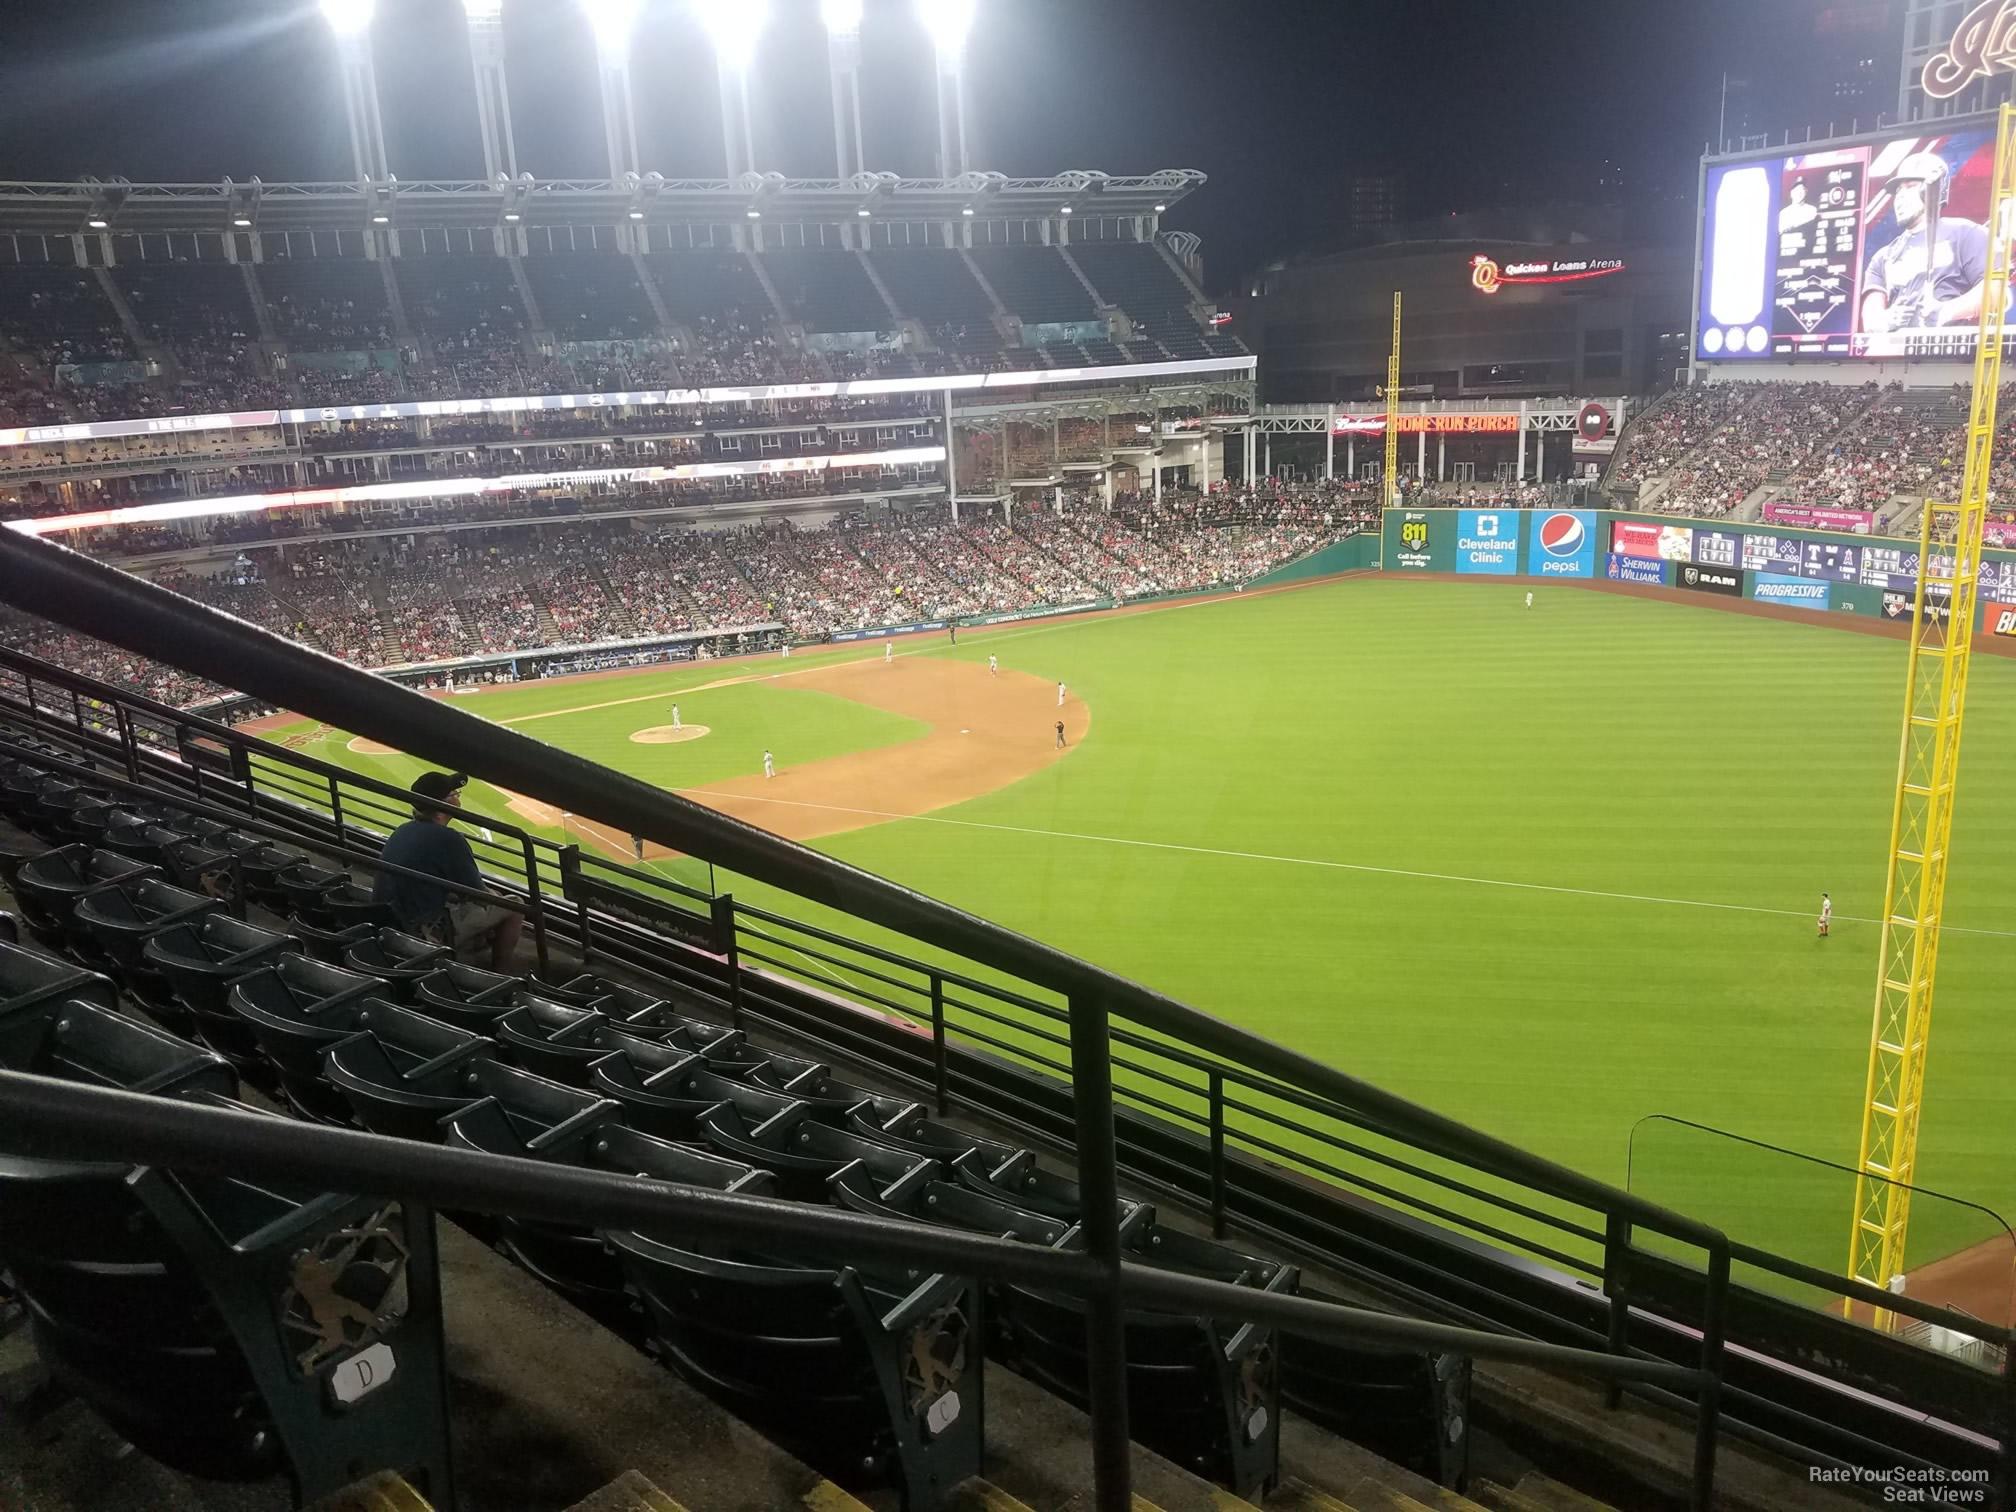 Section 422 at Progressive Field - RateYourSeats.com